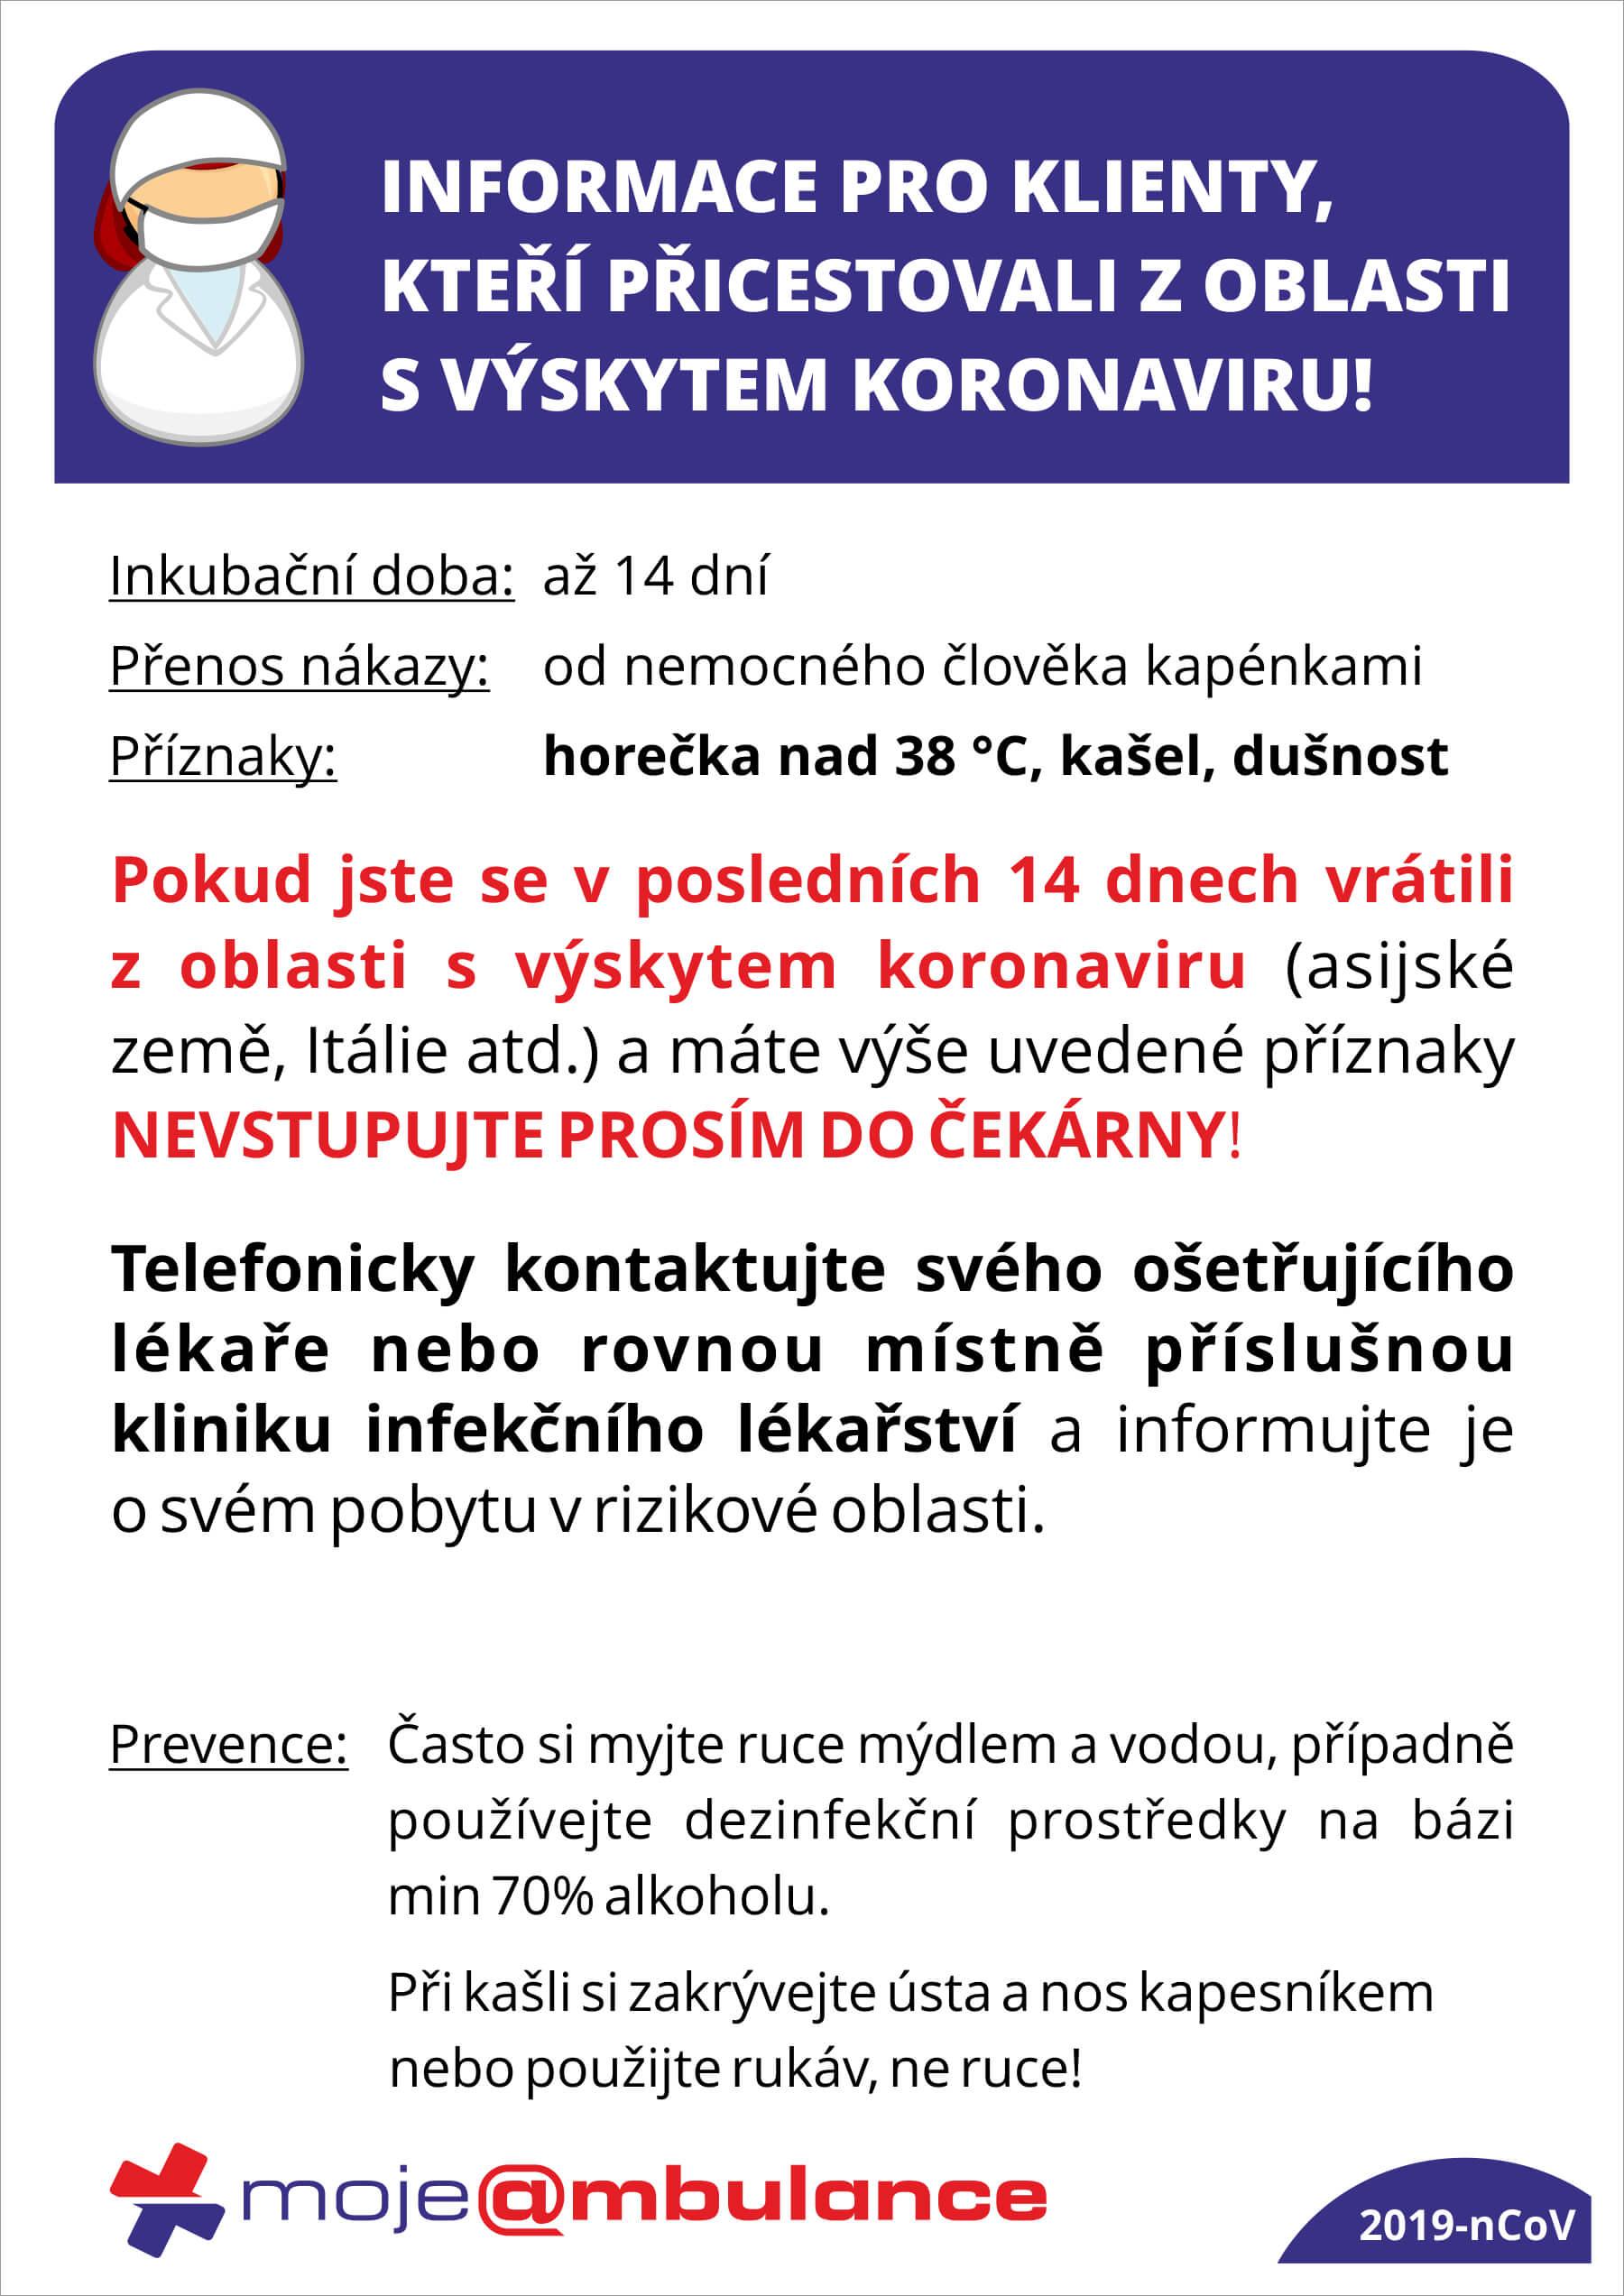 Koronavirus 2019 Ncov Mojeambulance Cz